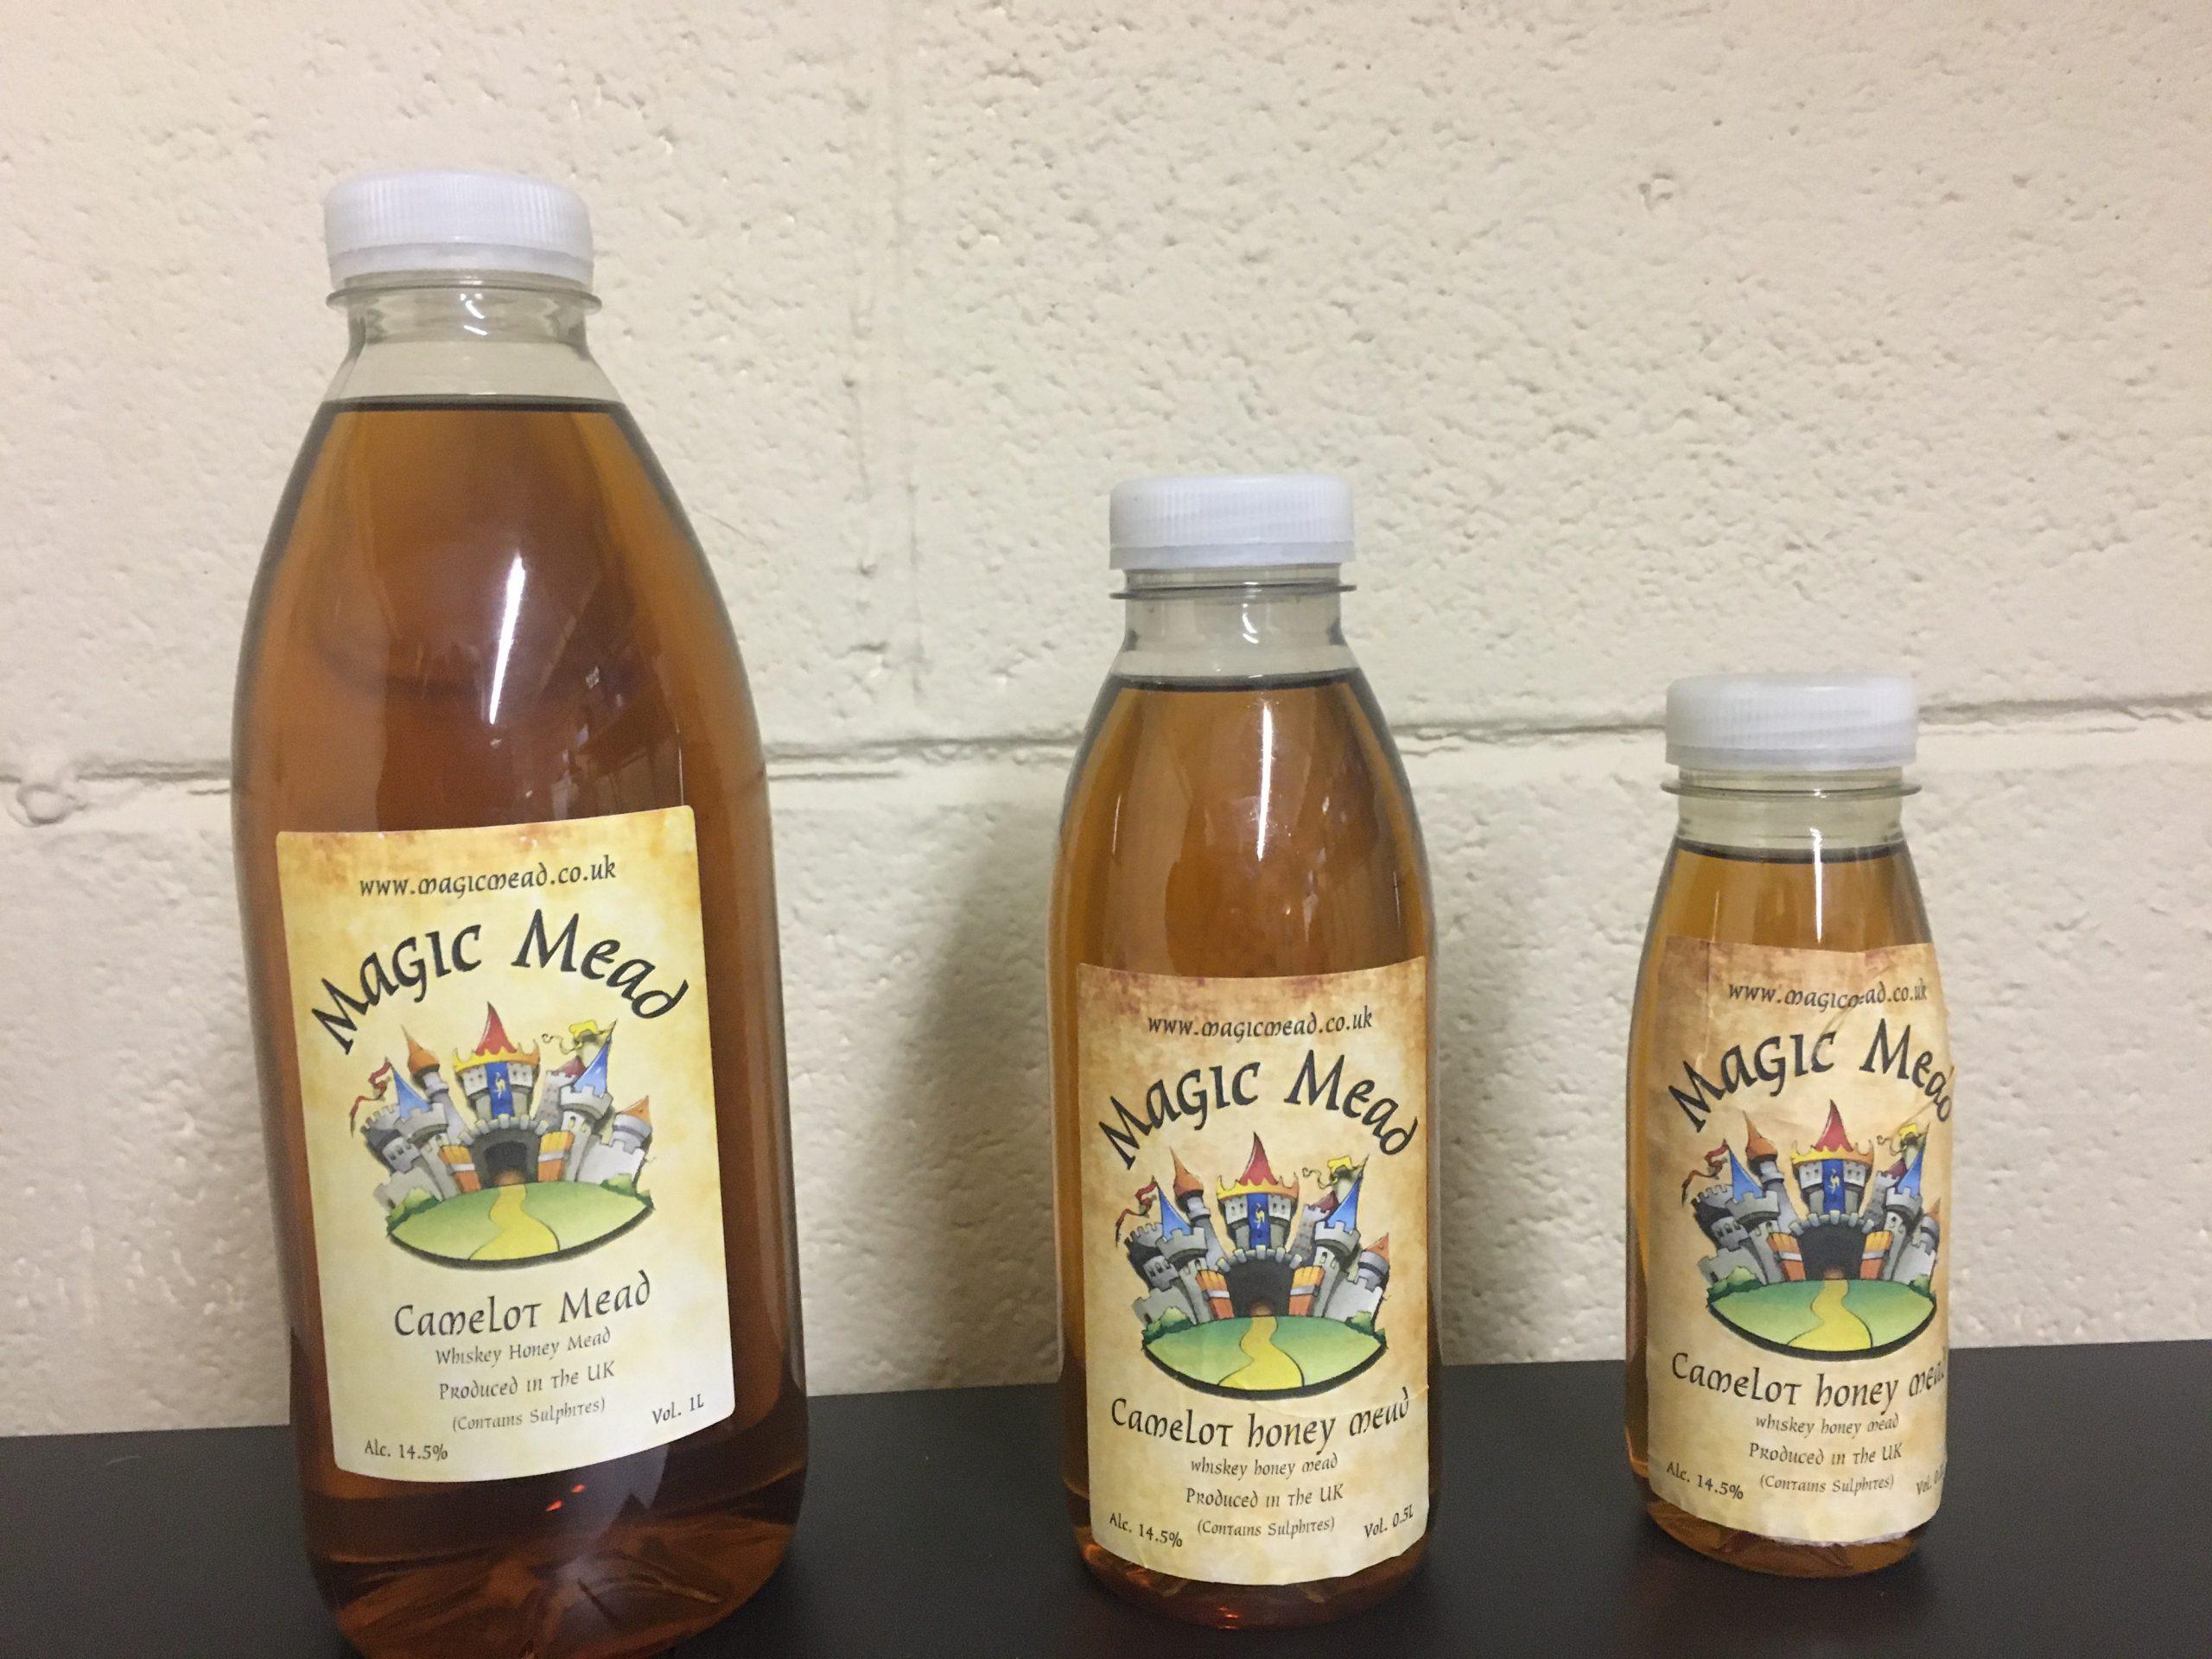 Brandy Honey Mead - (Crusader Honey Mead)